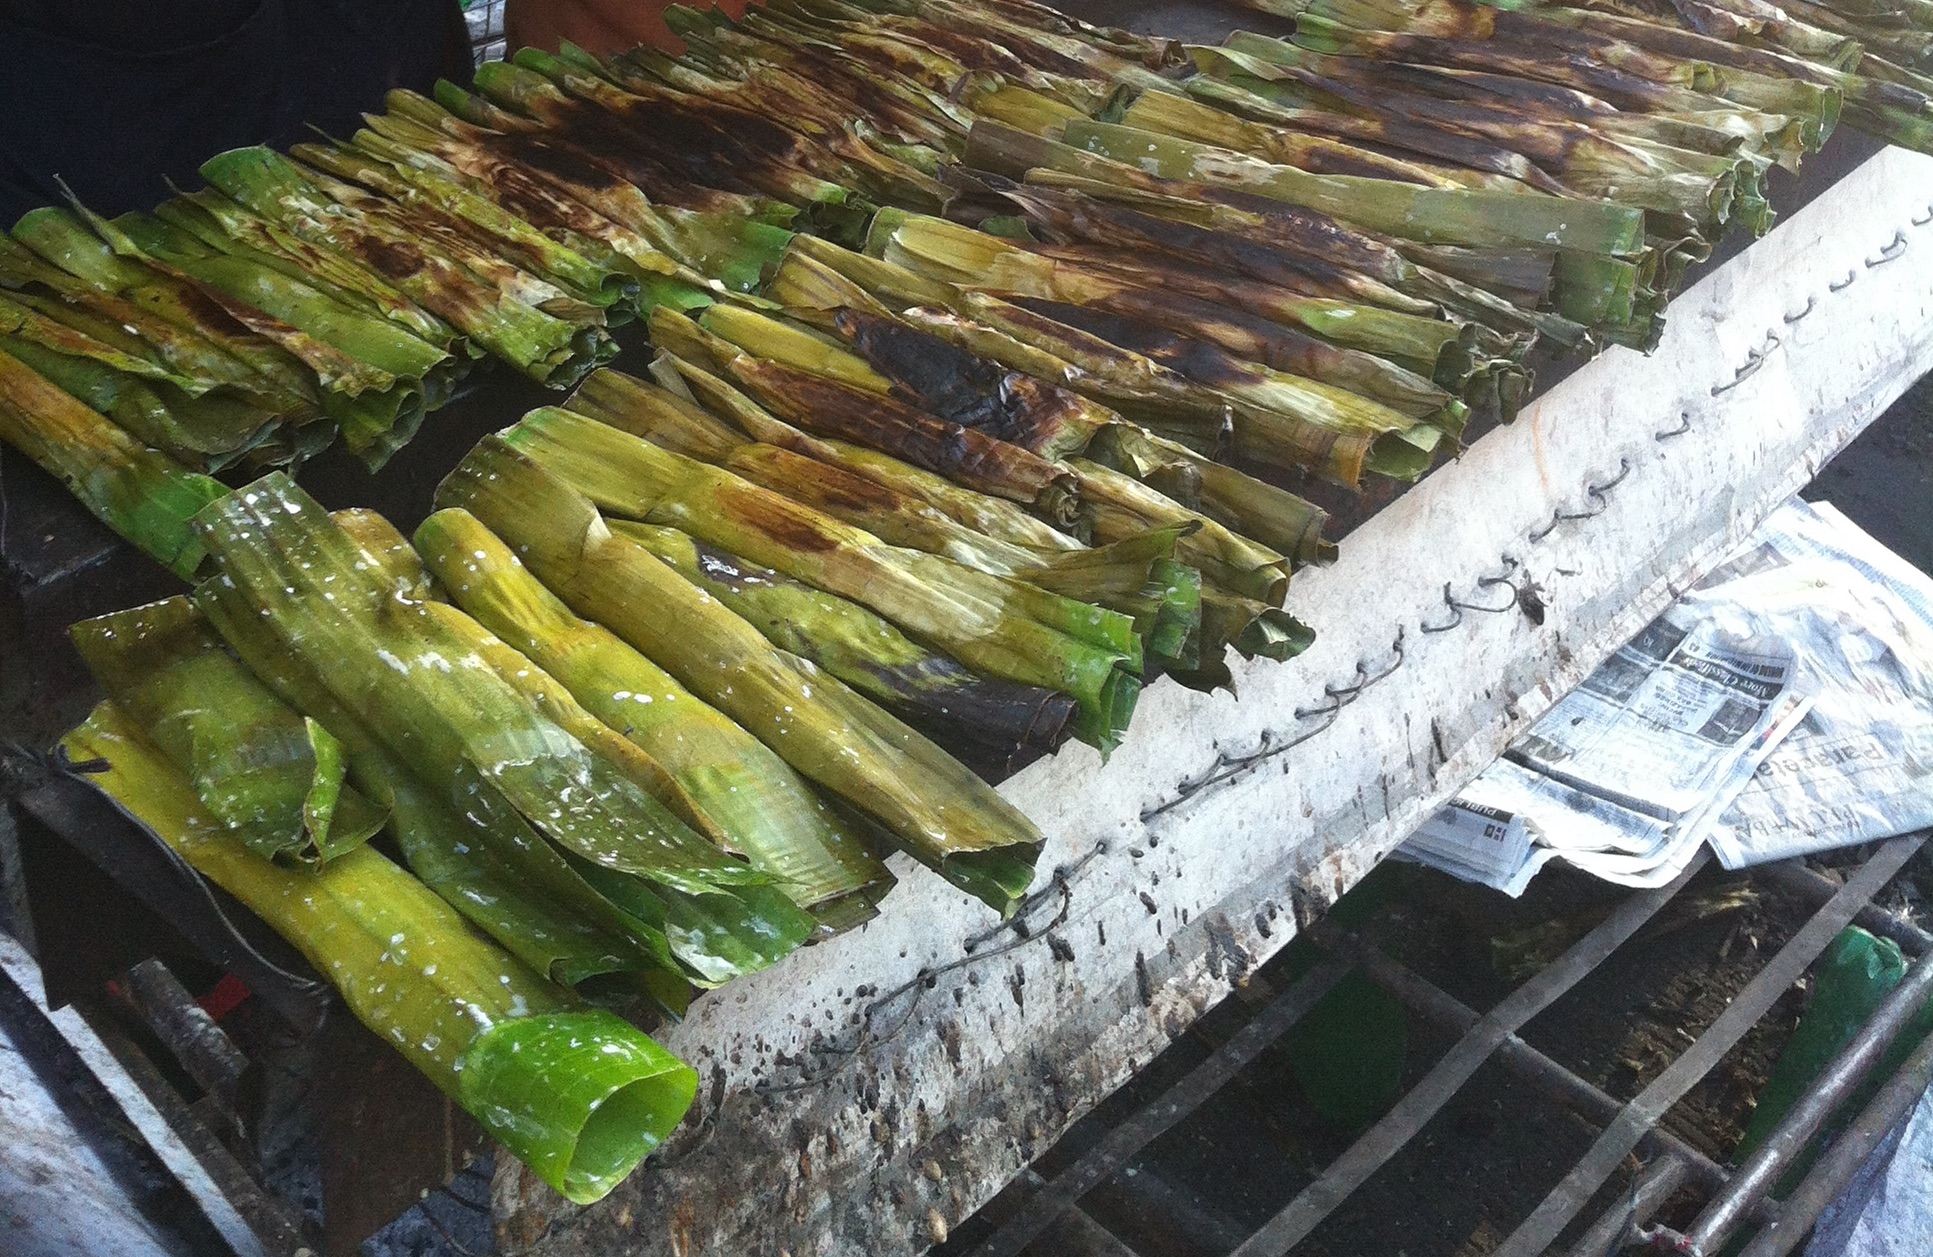 Bikol: a treat of grilled coconut rice (i think). Super yummy.